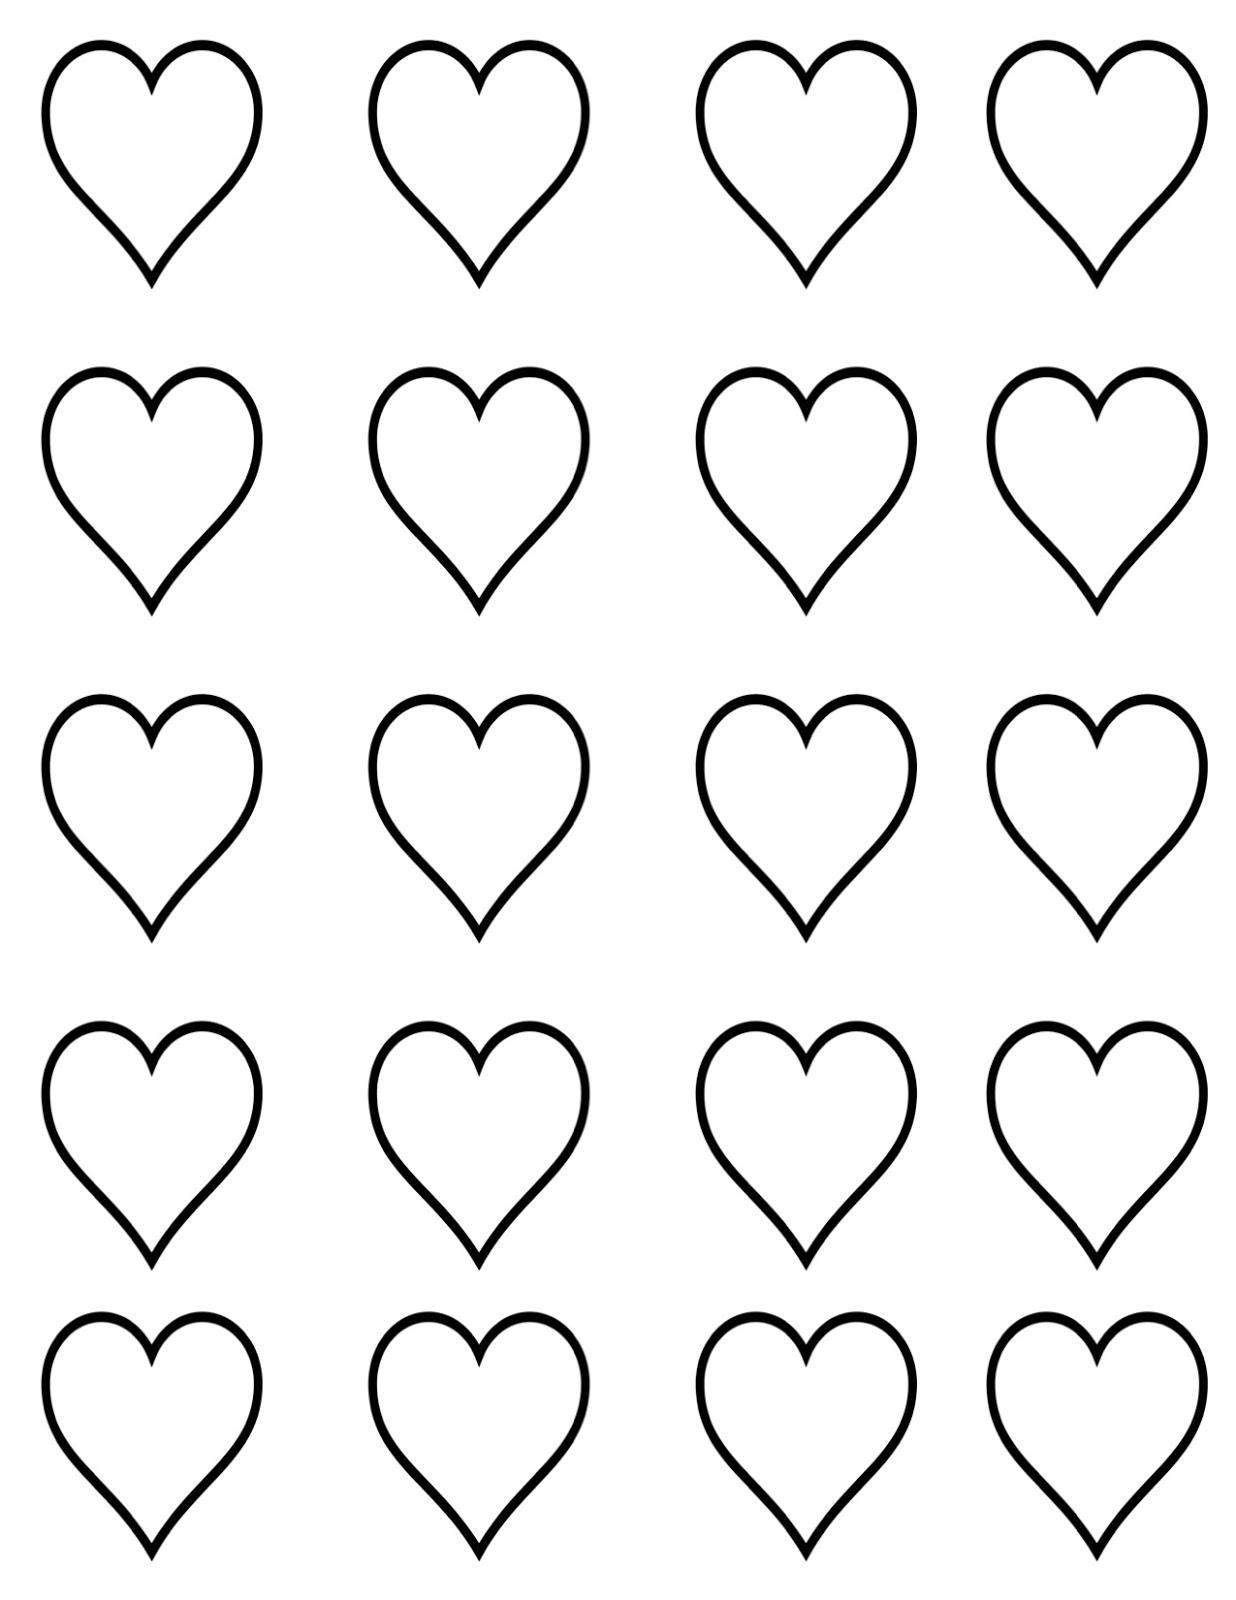 full page heart template - creative juice tutorial cupid heart macarons